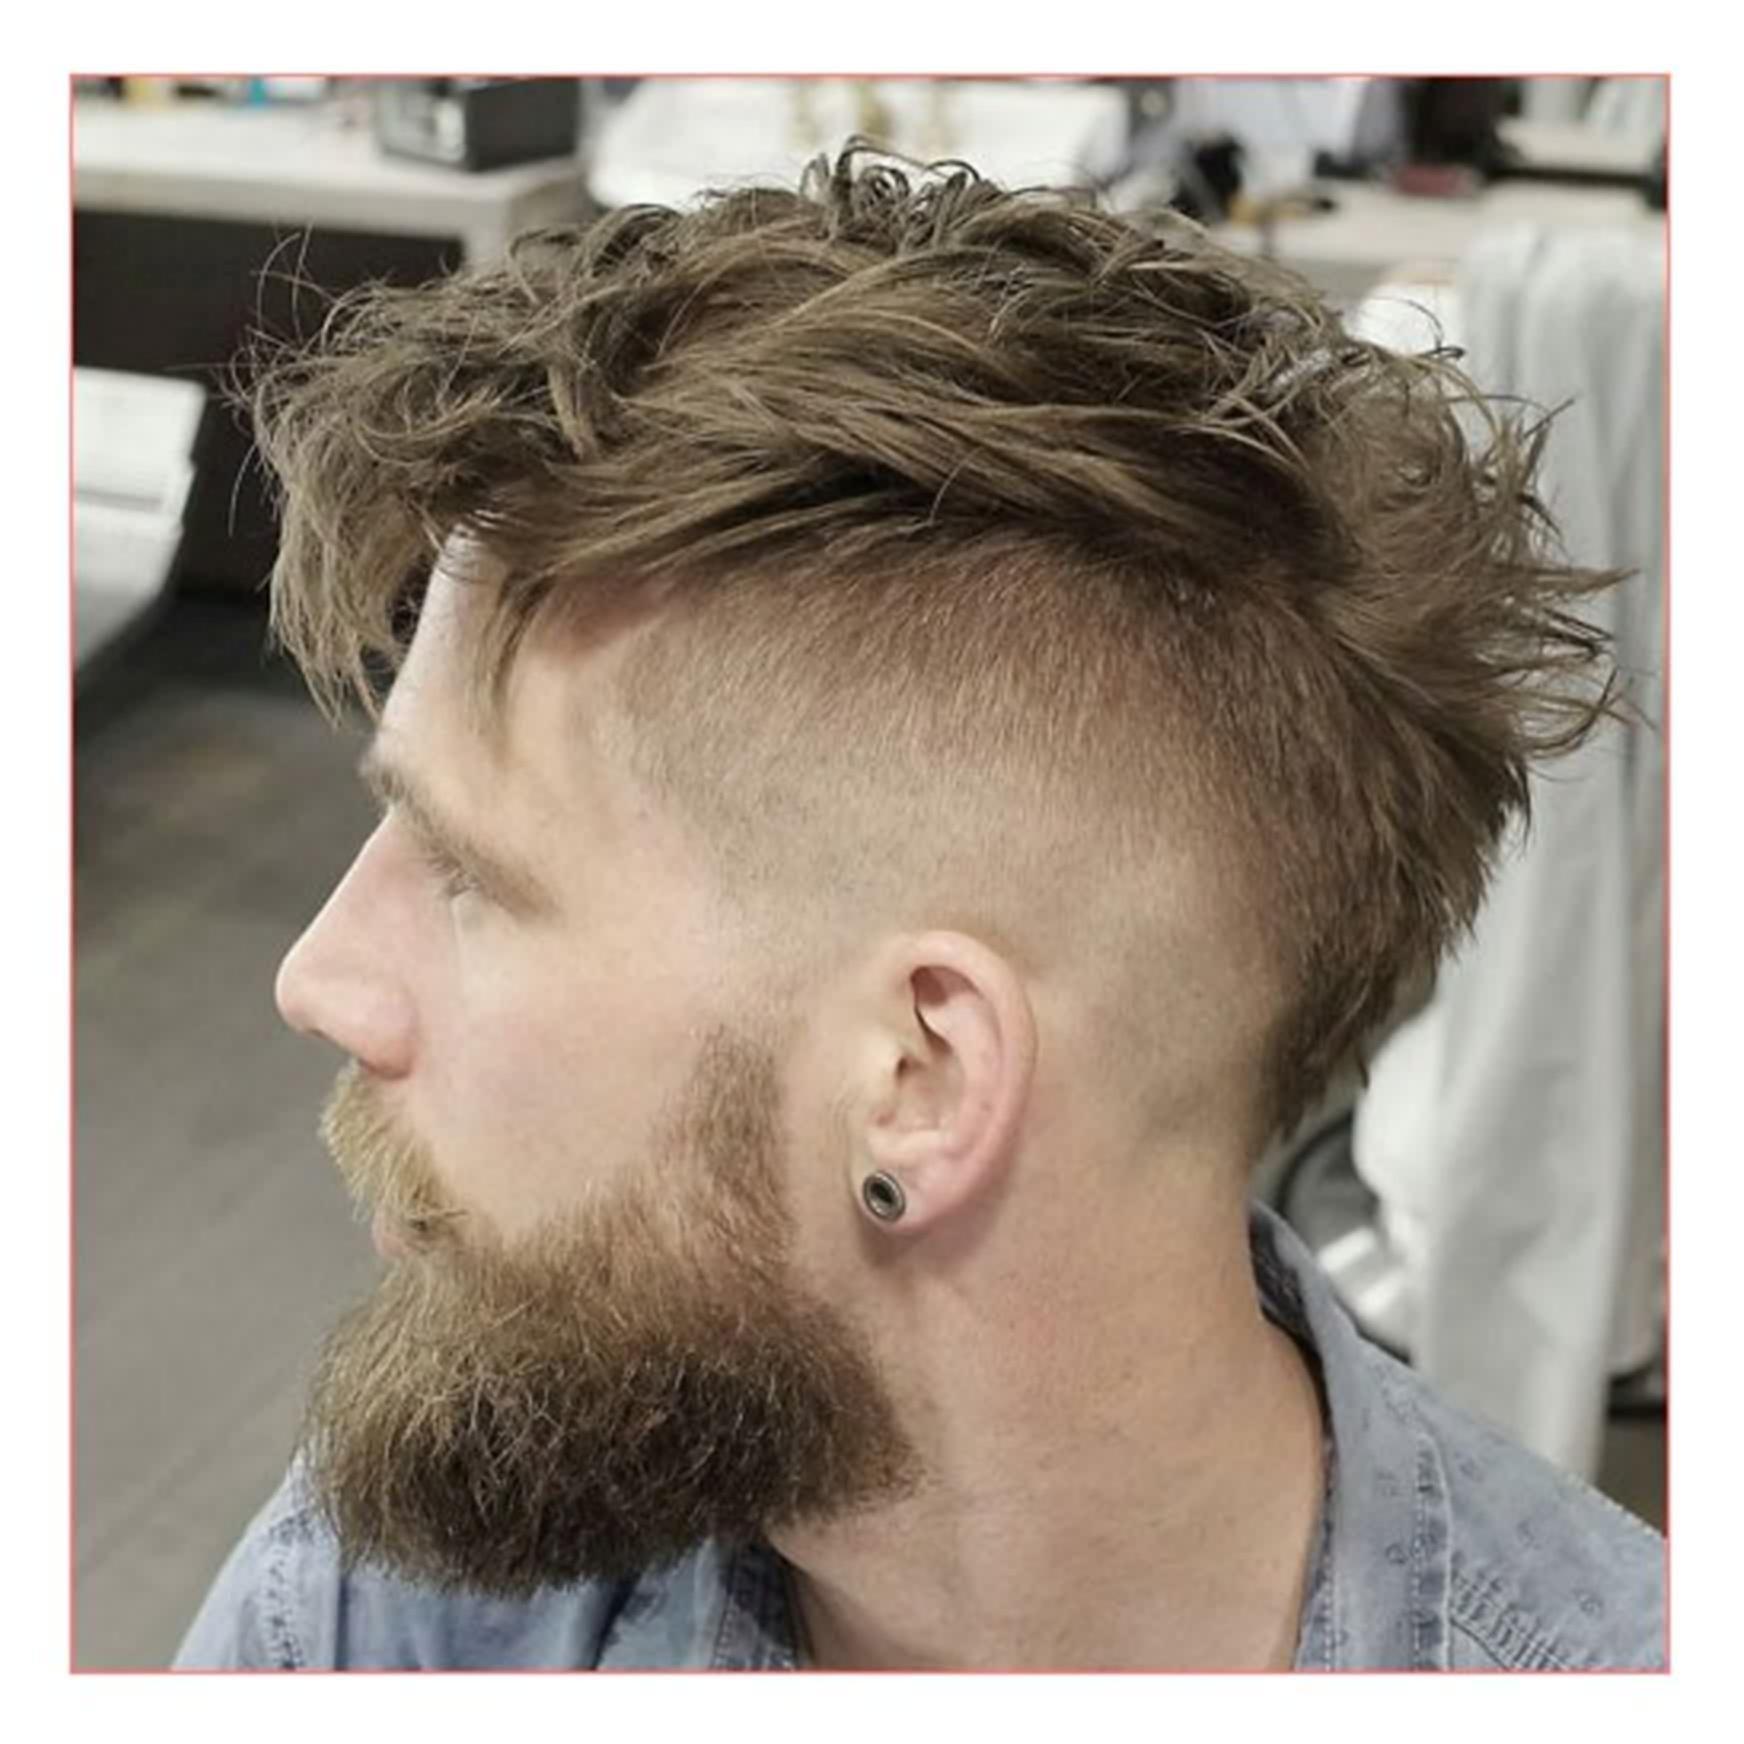 Long Hairstyles For Men Short Sides Men Hairstyles Short Sides Long Top Plus Undercut With Messy Faux Hawk And Muzhskie Pricheski Pricheska Muzhchiny Strizhki Parnej